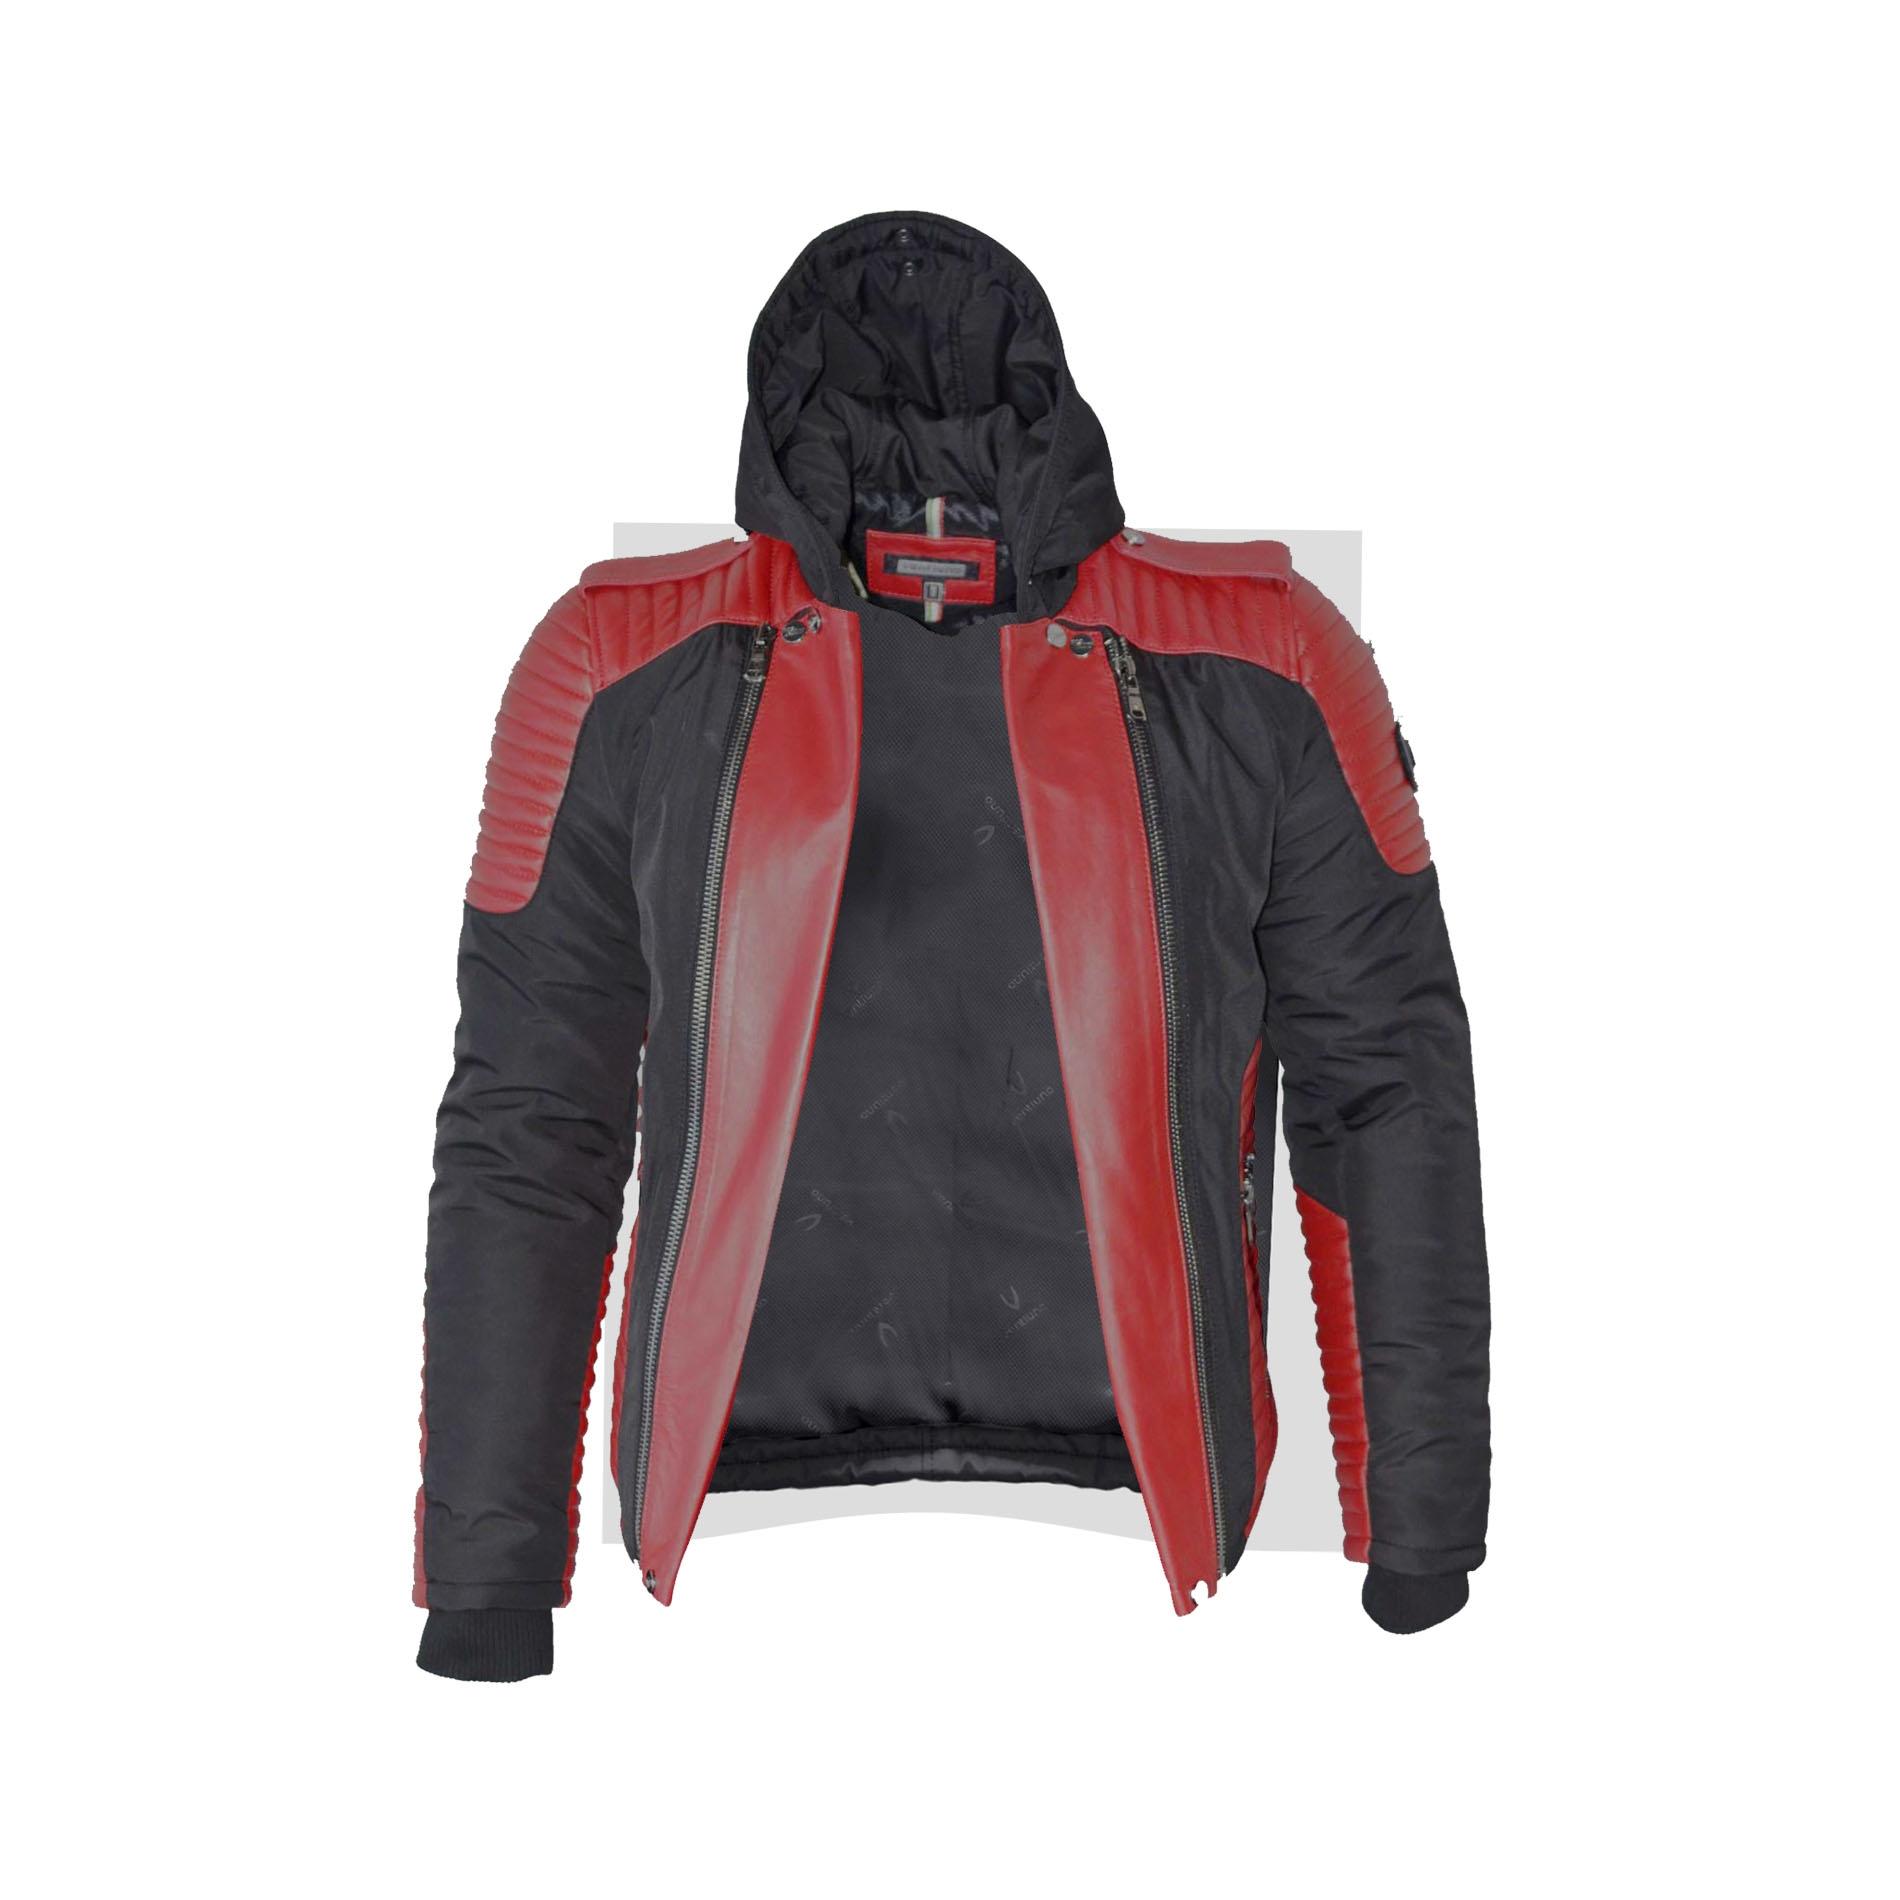 Ventiuno maserati veste doudoune bi mati re rouge fourrure v ritable rouge m ches blances taille - Meche rouge homme ...